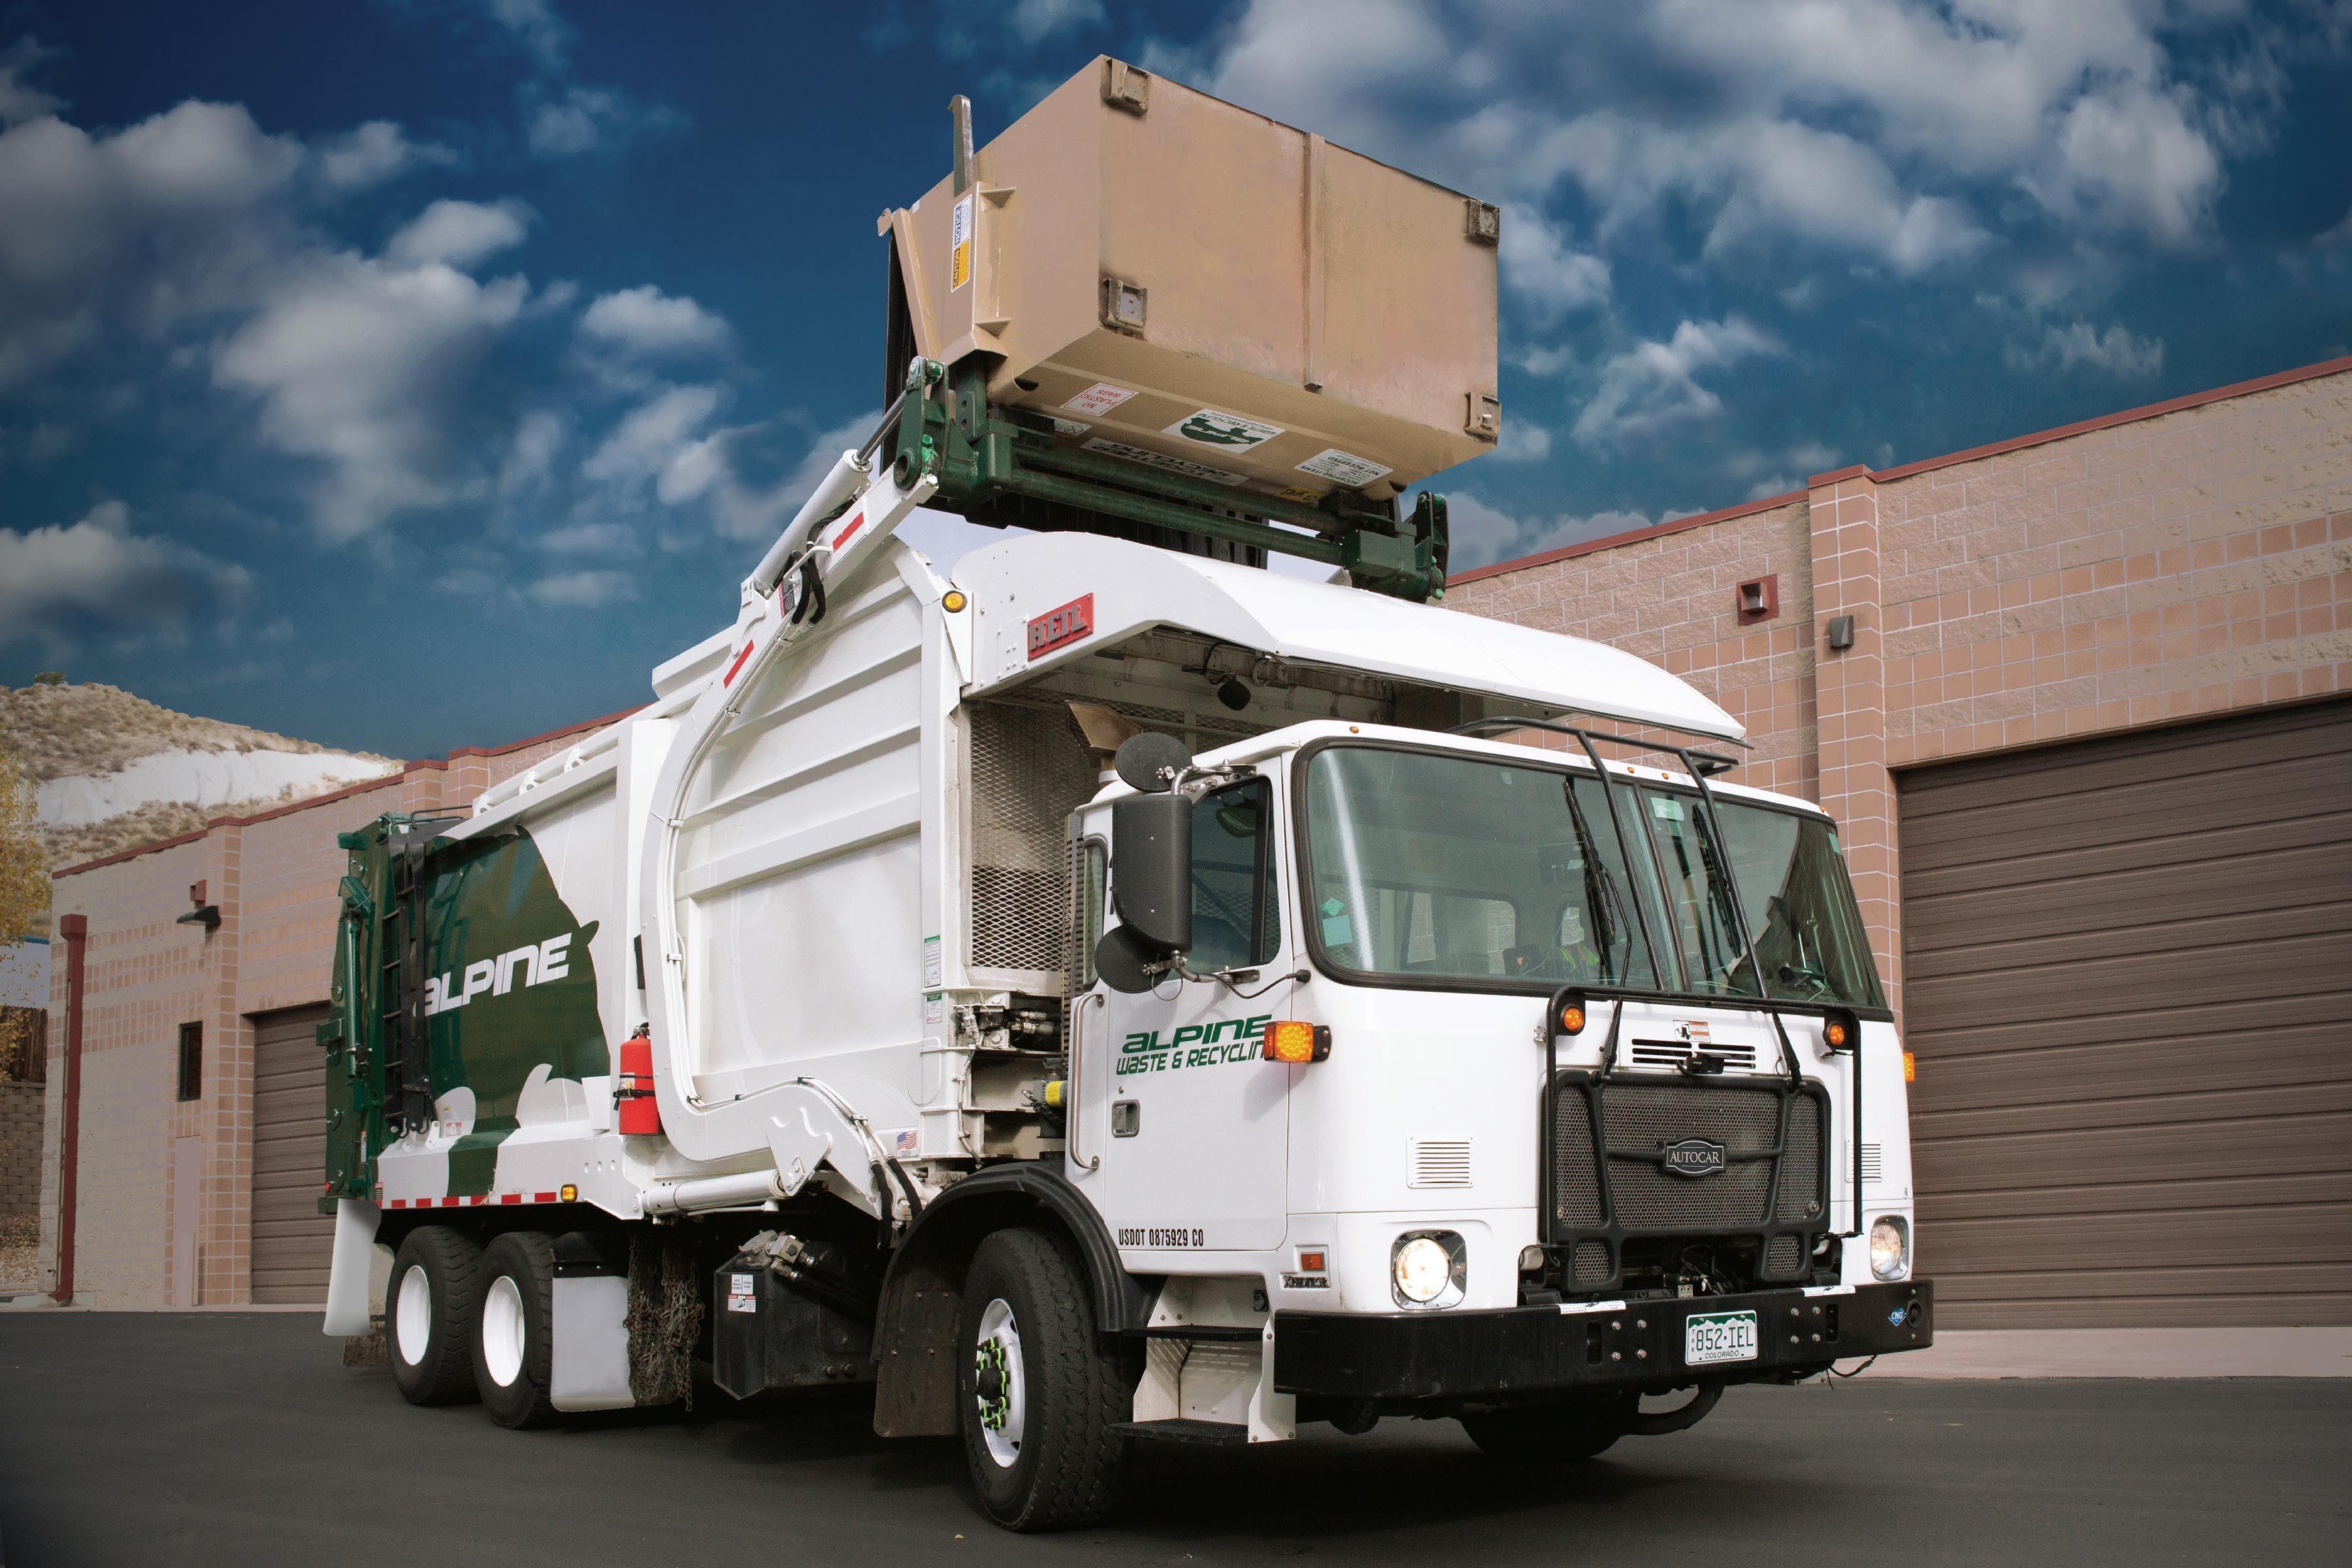 Garbage Truck Diagram 2017 Autocar Acx64 Cfl Garbage Truck W Heil Body Of Garbage Truck Diagram